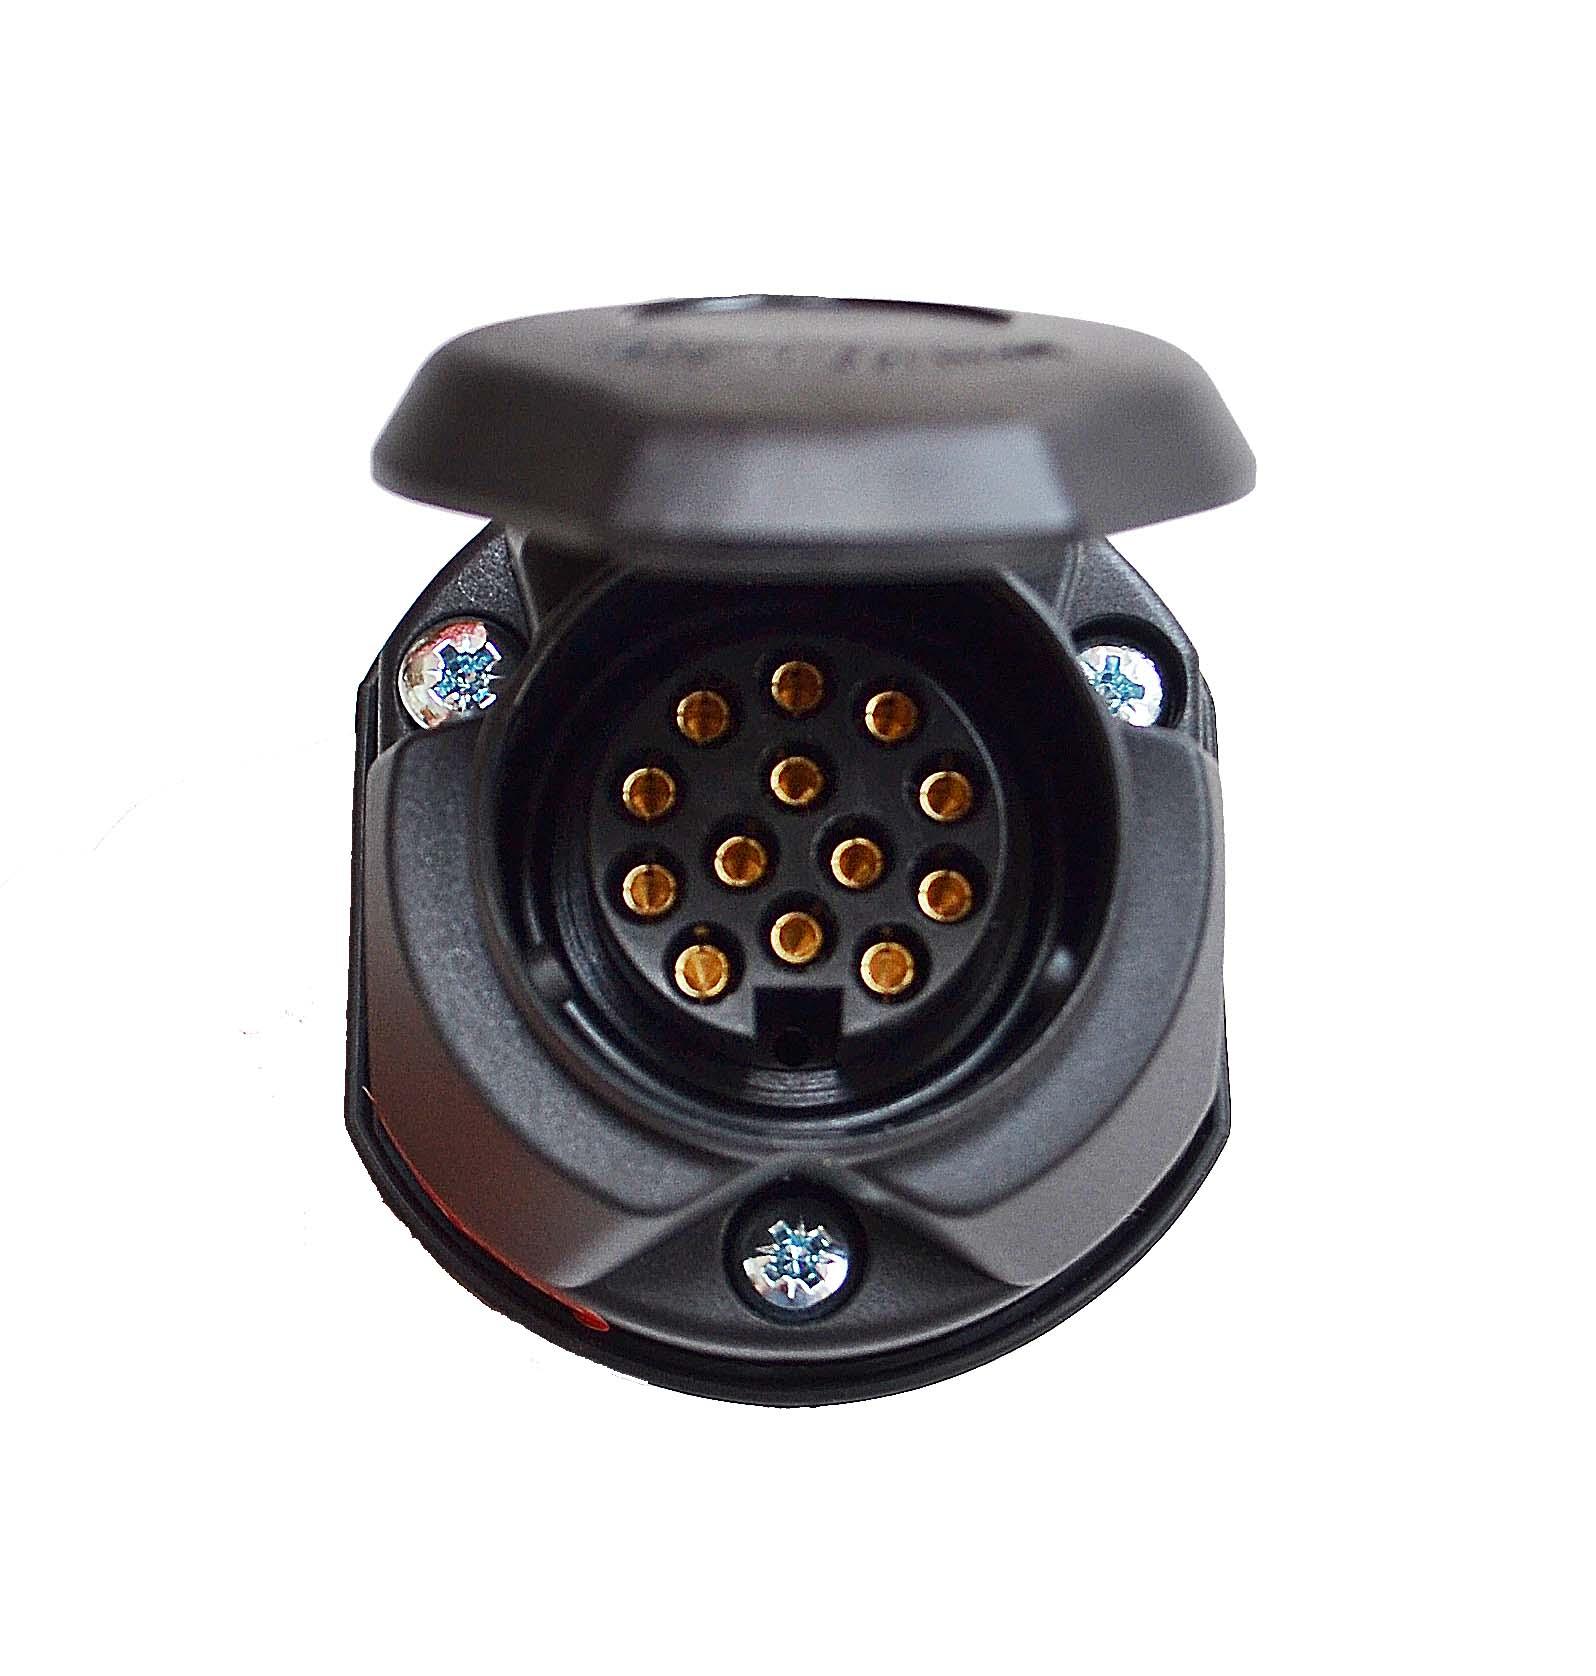 13 pin socket wiring diagram ez go txt battery towing electrics